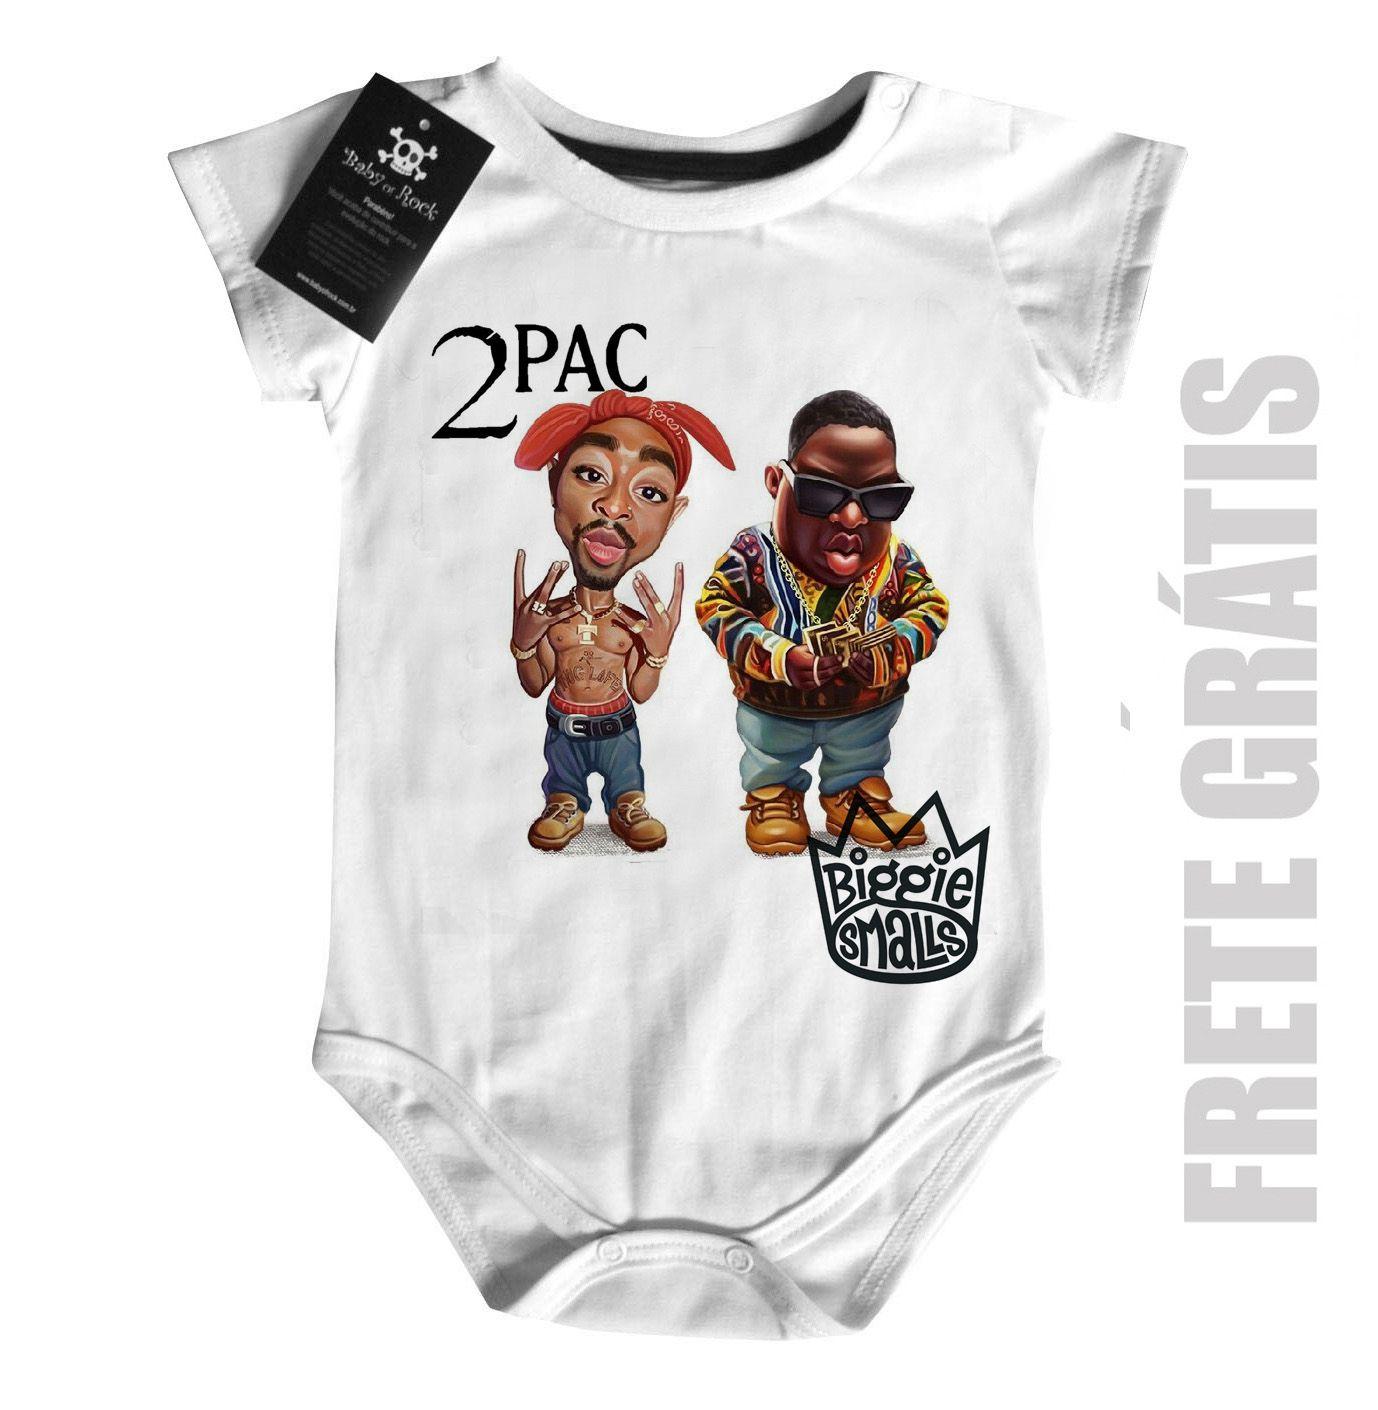 Body  Rap / Hip-hop  2 pac e Biggie Smalls - White  - Baby Monster - Body Bebe